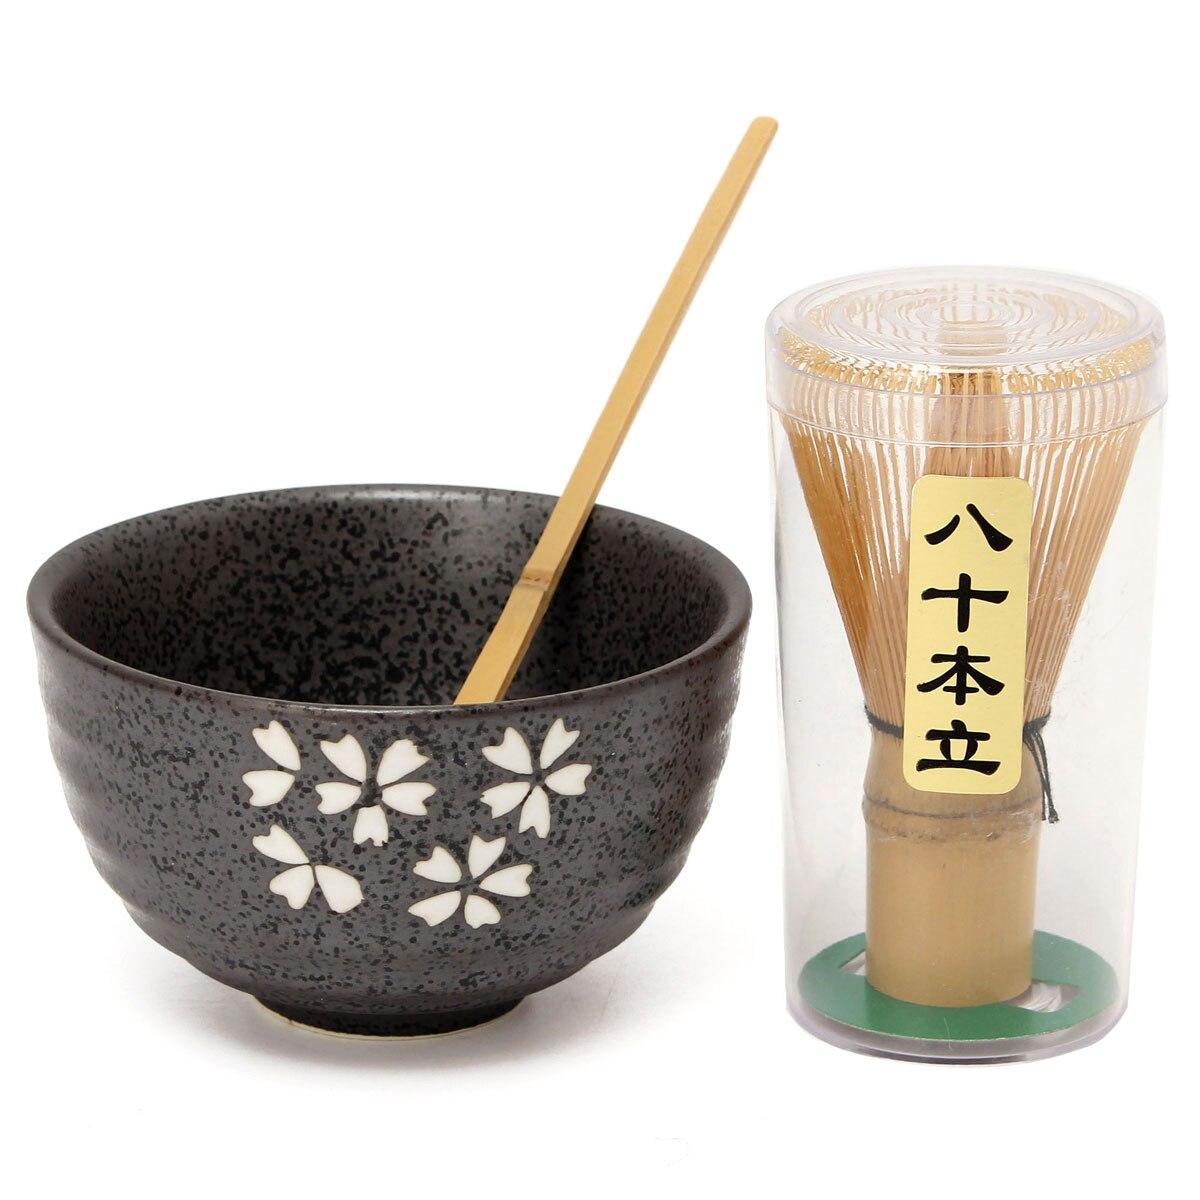 online buy wholesale chinese tea accessories from china chinese  -  styles pcsset bamboo chasen matcha whisk chashaku tea scoop matcha bowlceramic tea